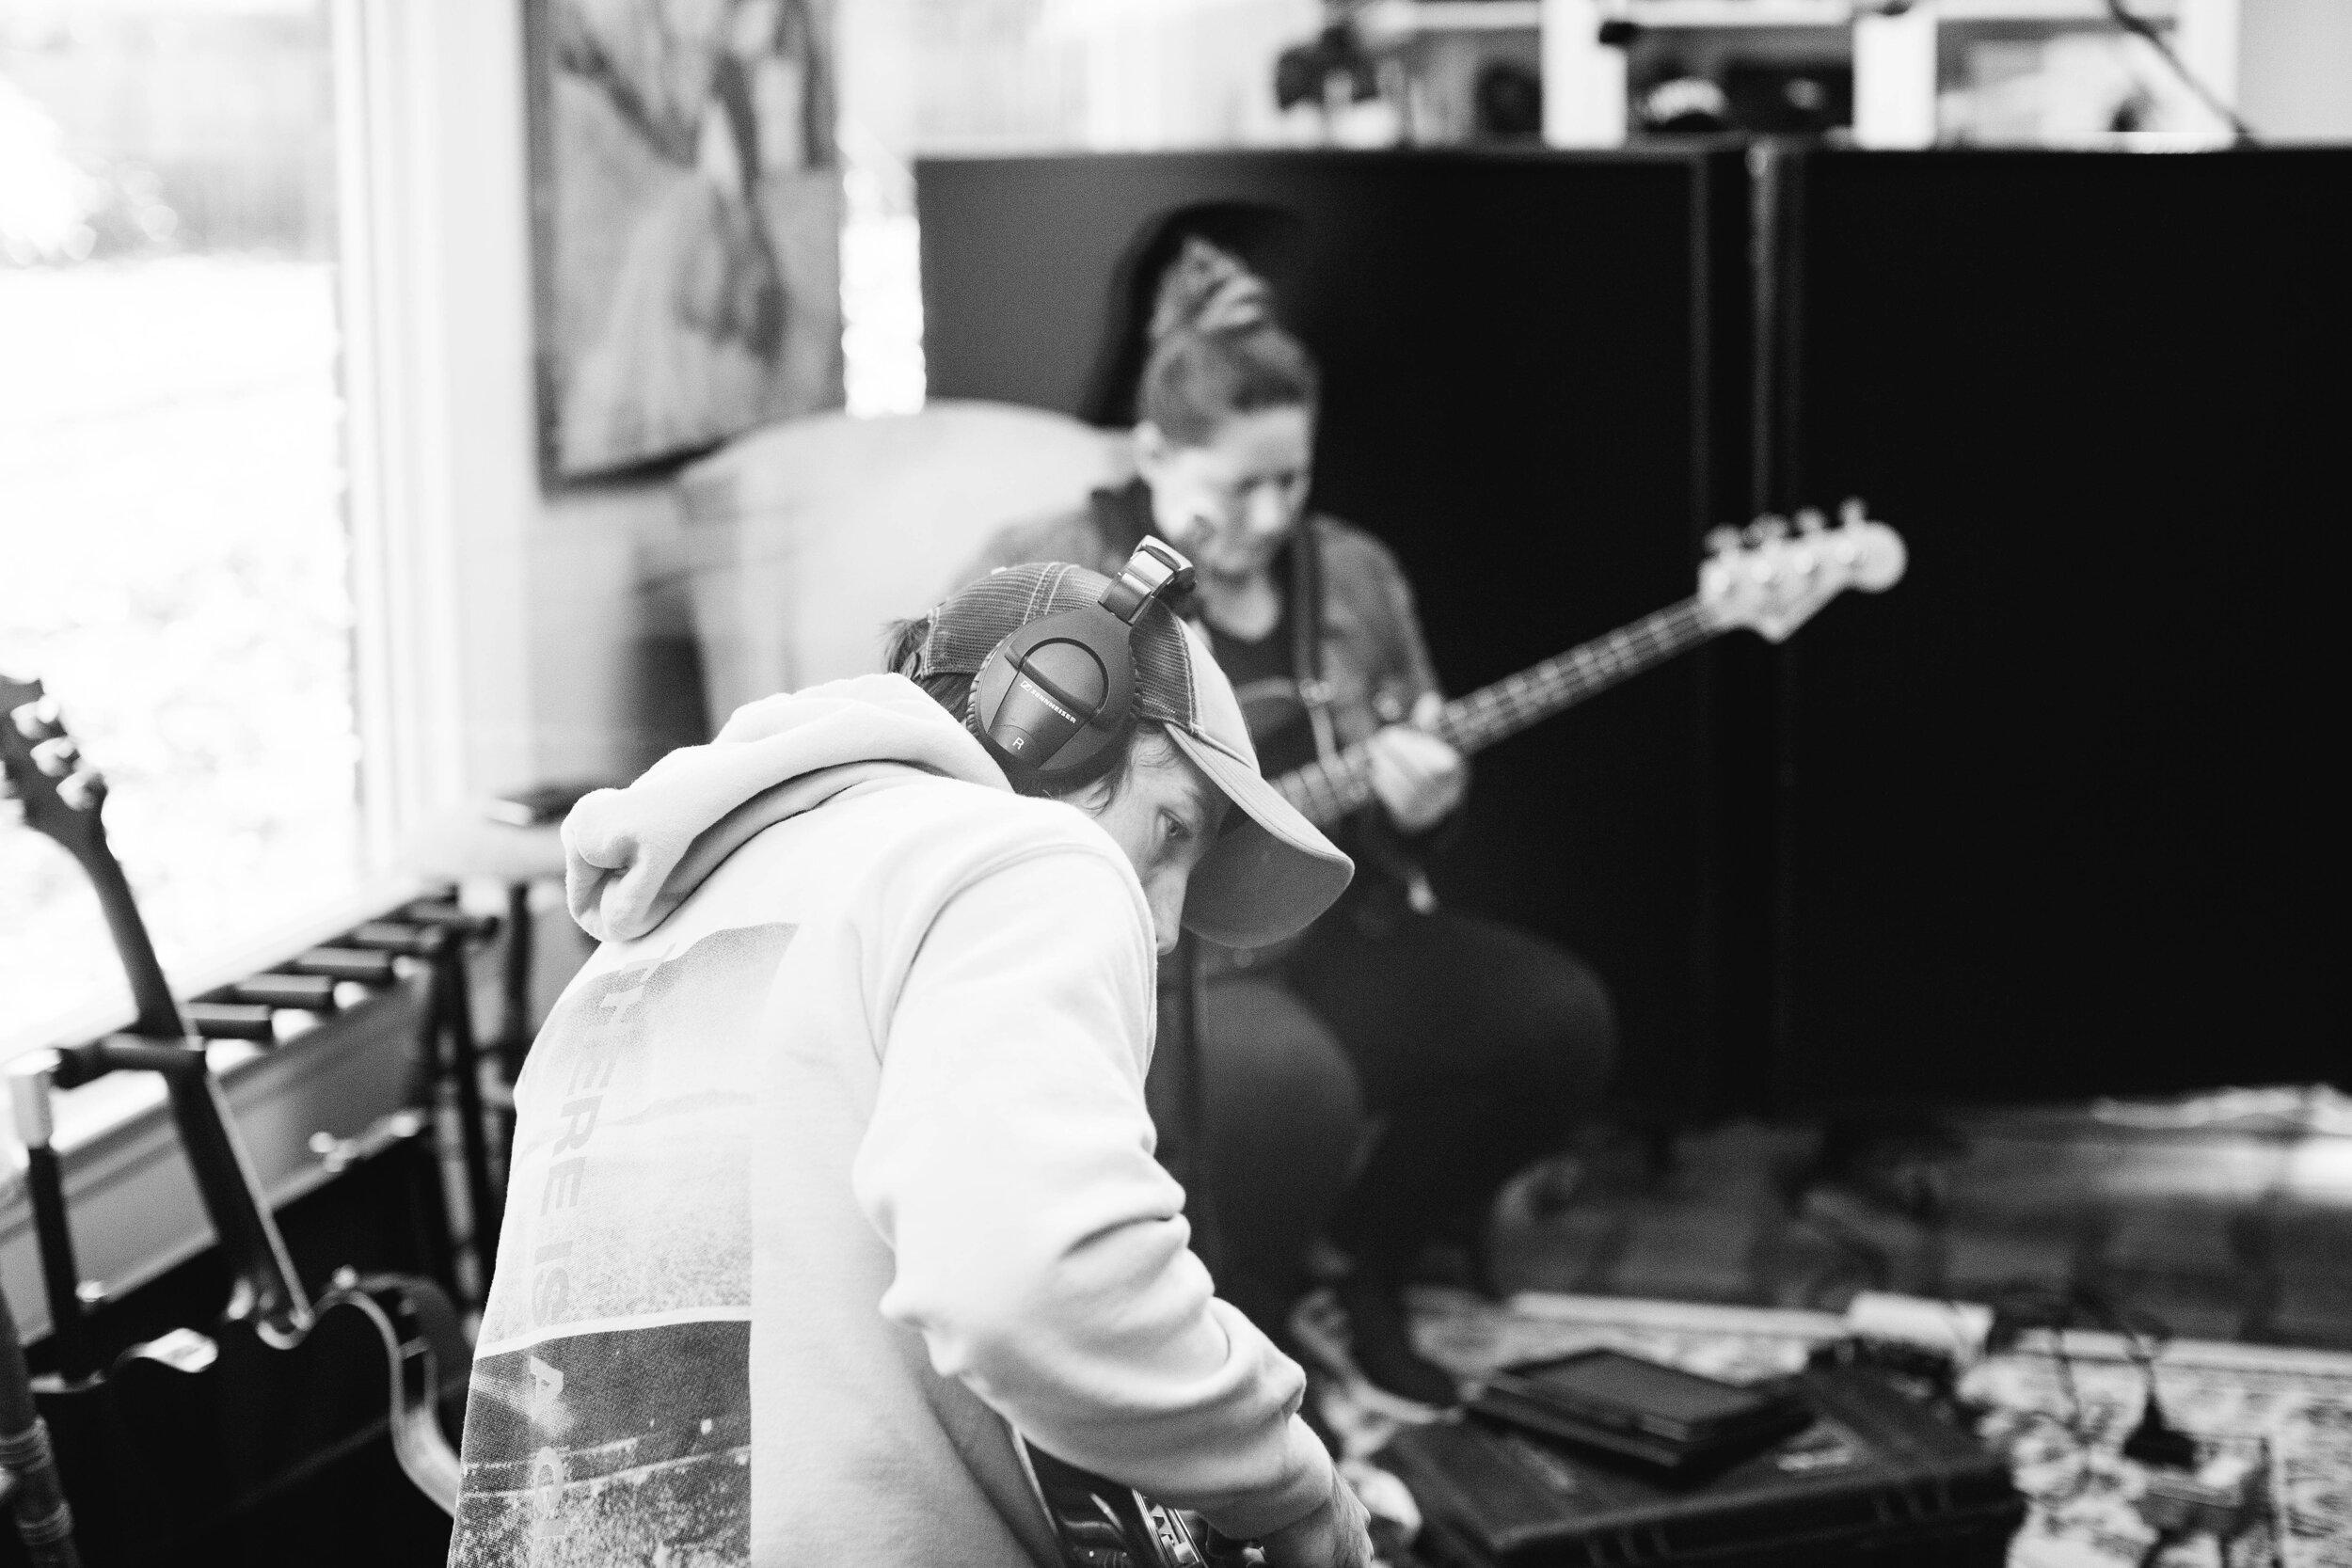 20190122_We_Rise_We_Bow_Studio-8.jpg